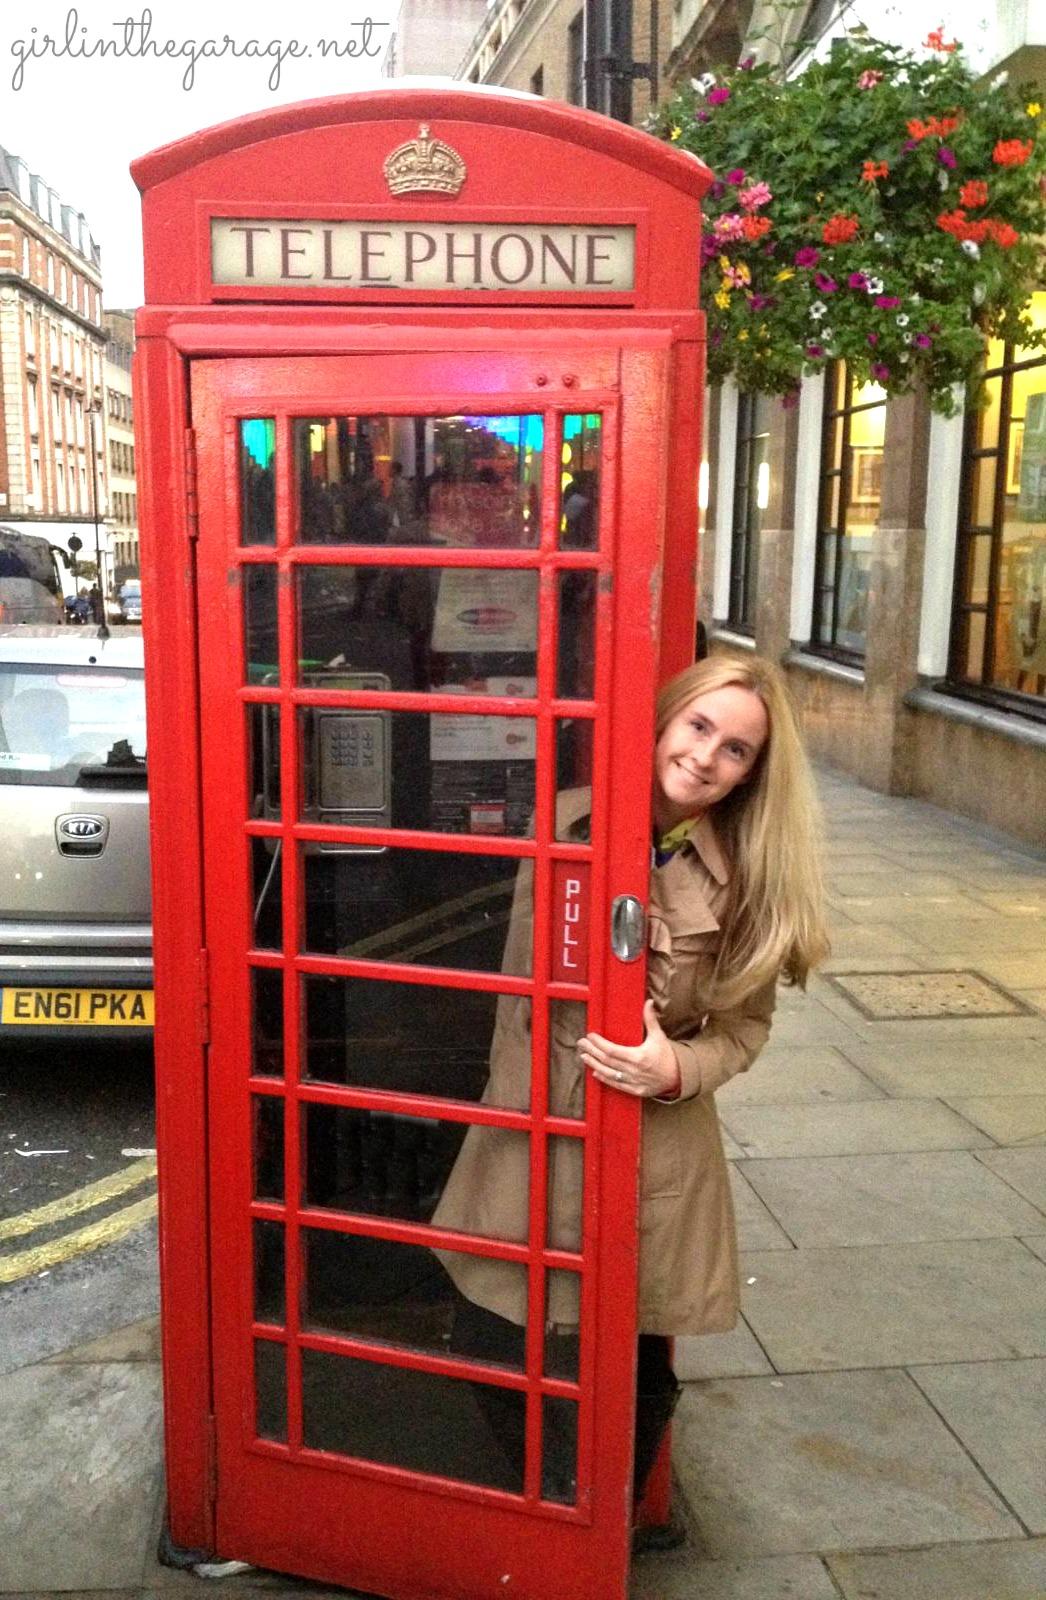 London phone booth - girlinthegarage.net